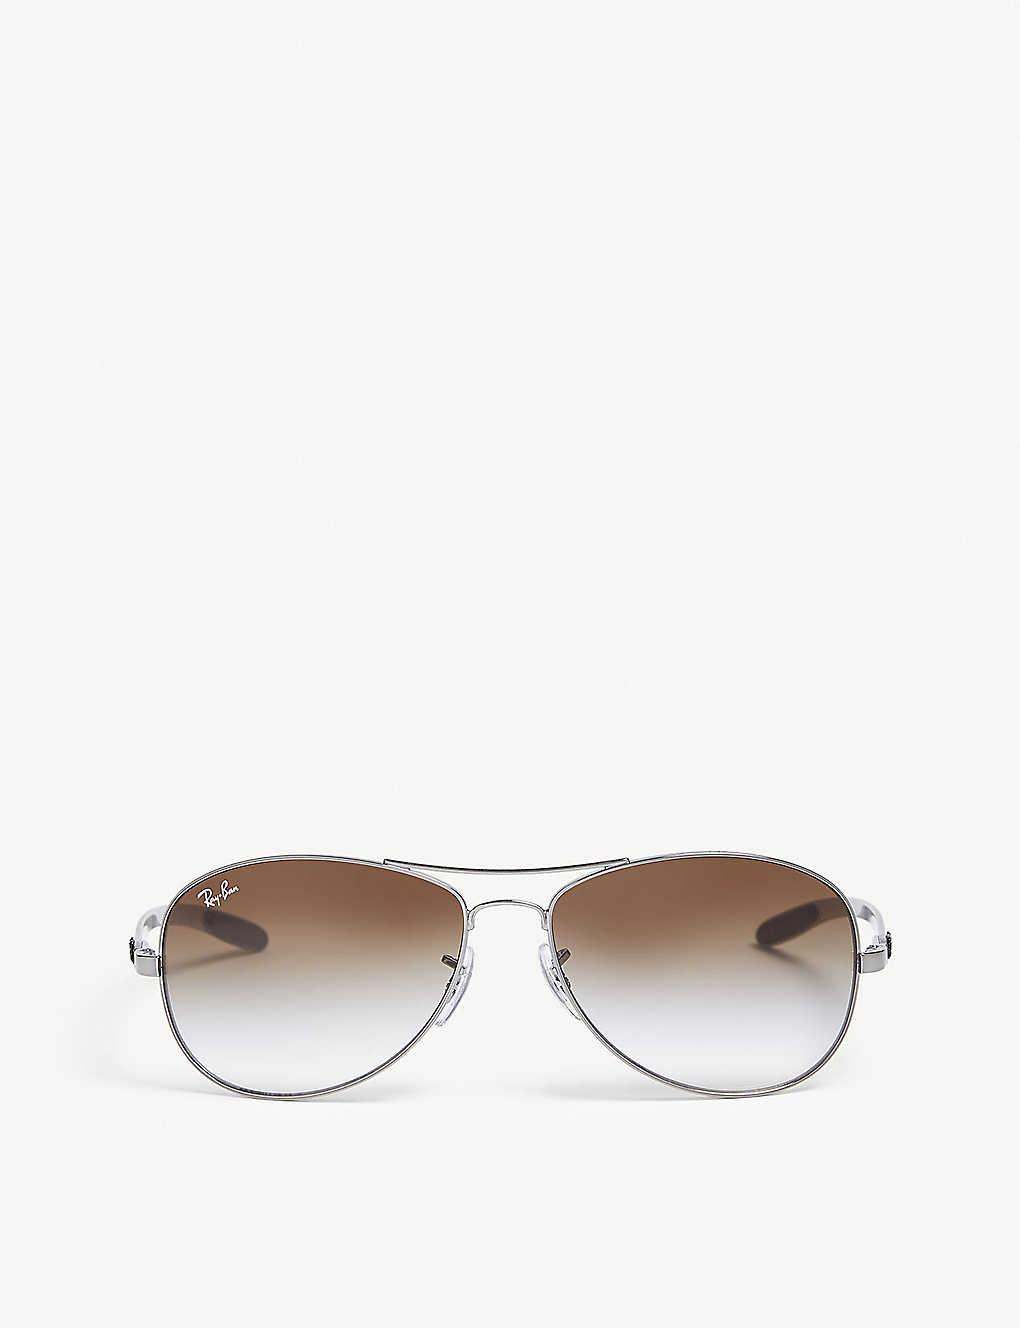 c24360fee4 RAY-BAN - RB8301 pilot-frame sunglasses